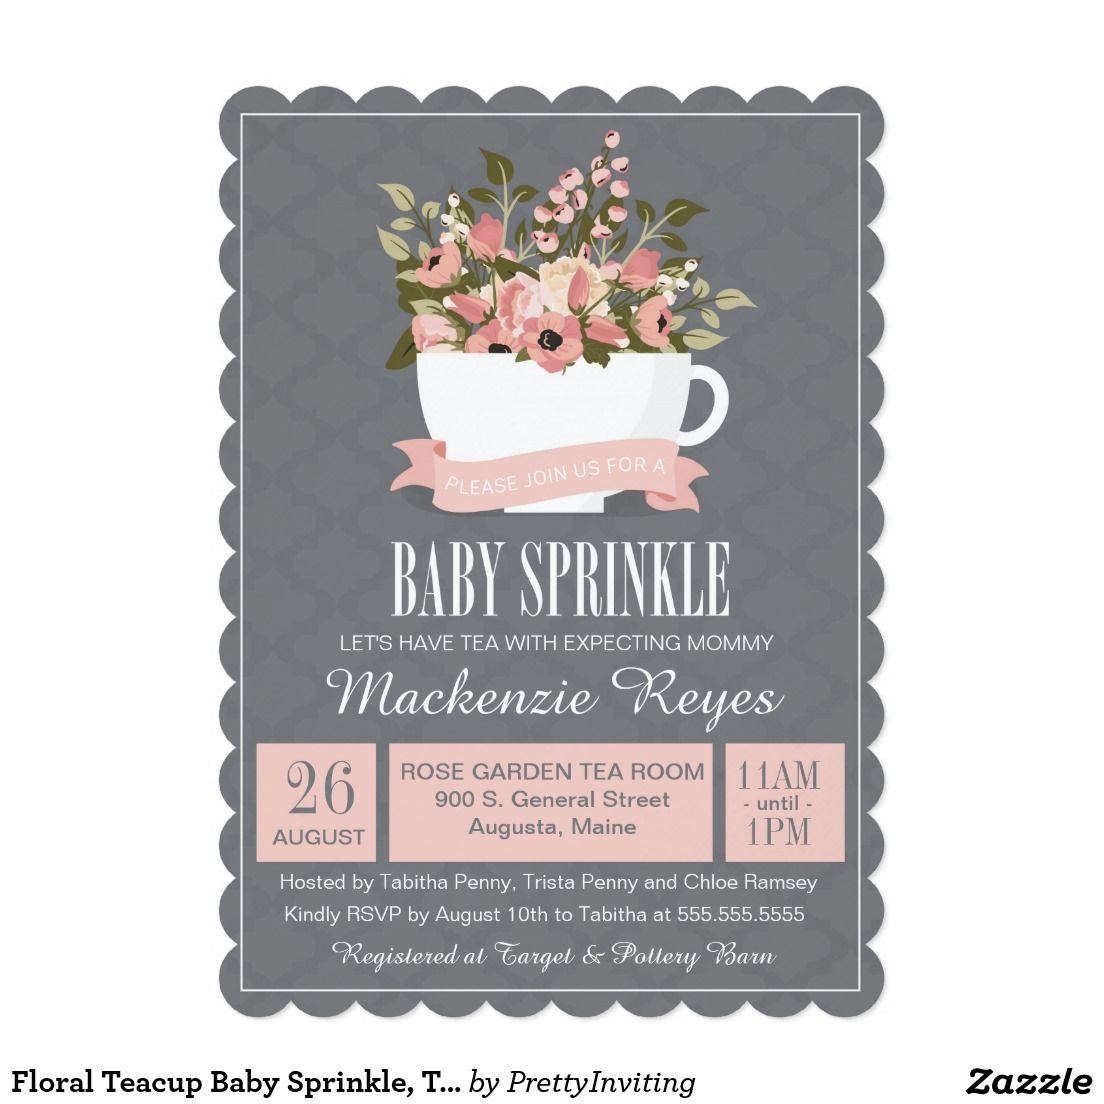 Floral Teacup Baby Sprinkle, Tea Party Invitation | Tea party ...